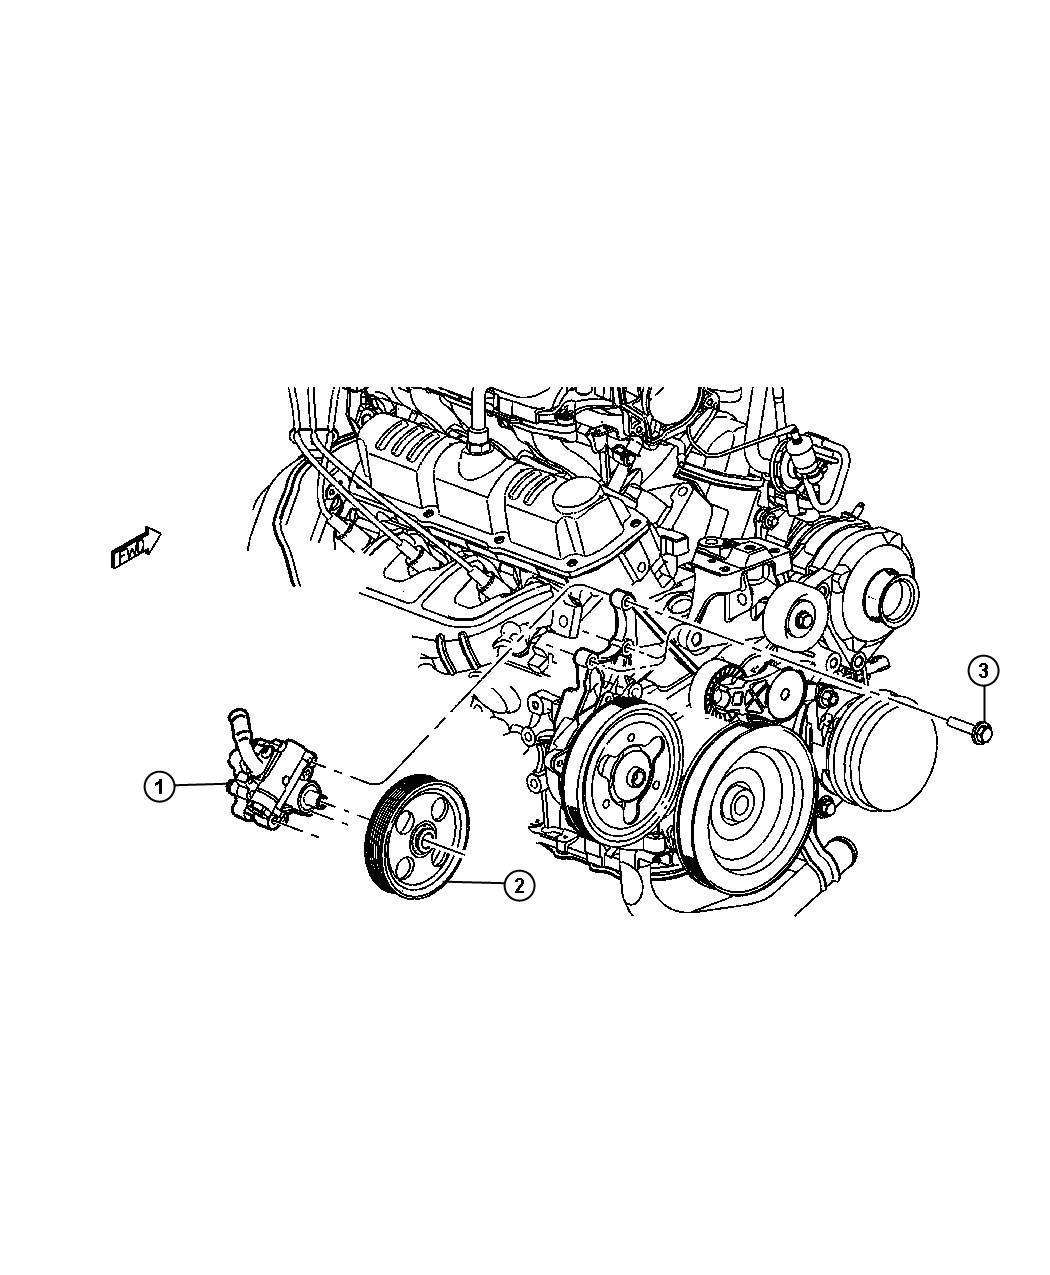 Chrysler Pt Cruiser Pump Power Steering Pinion